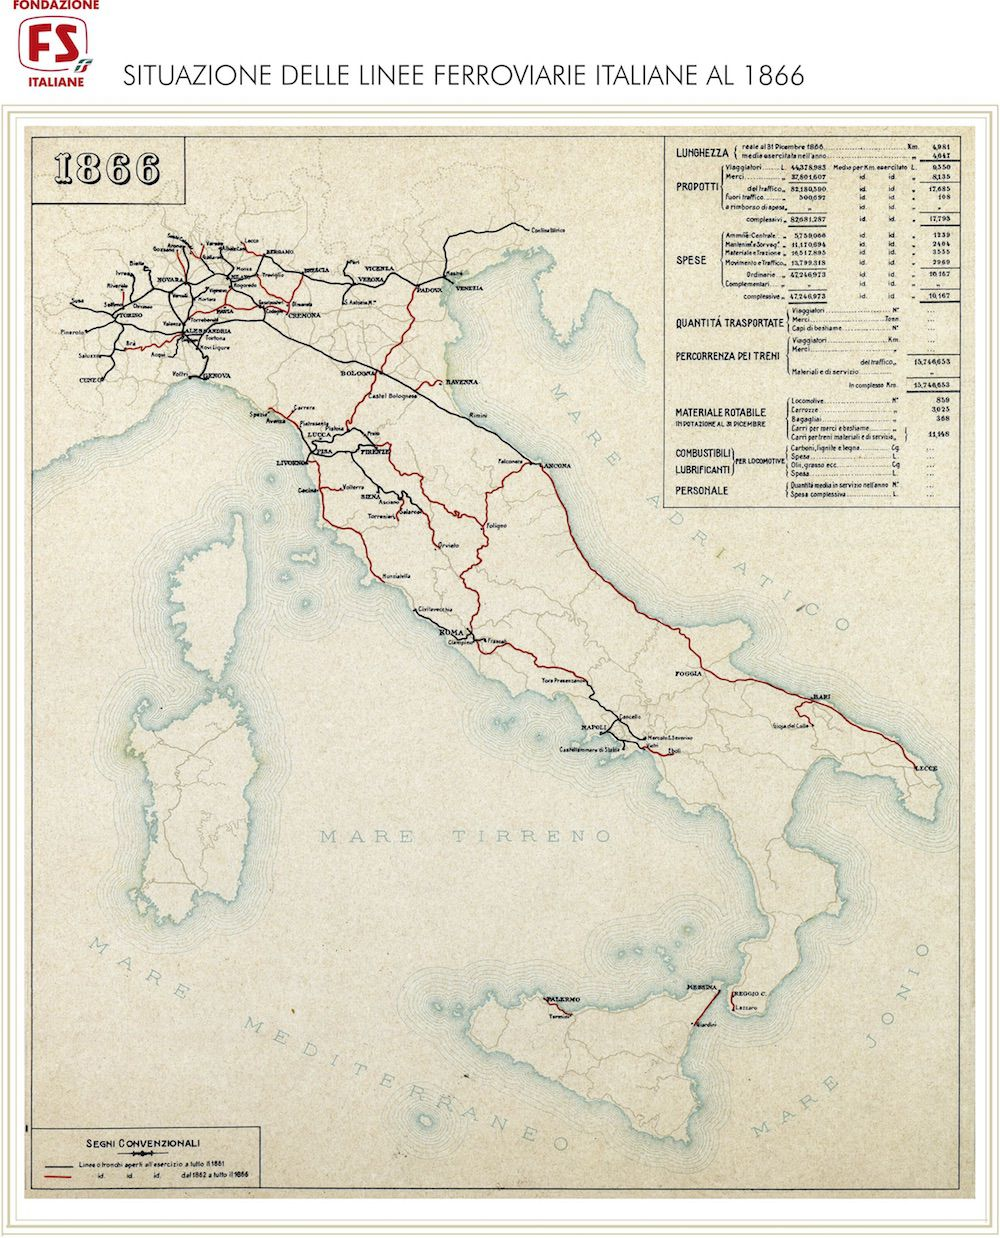 carta_ferrovie_2_1866_518